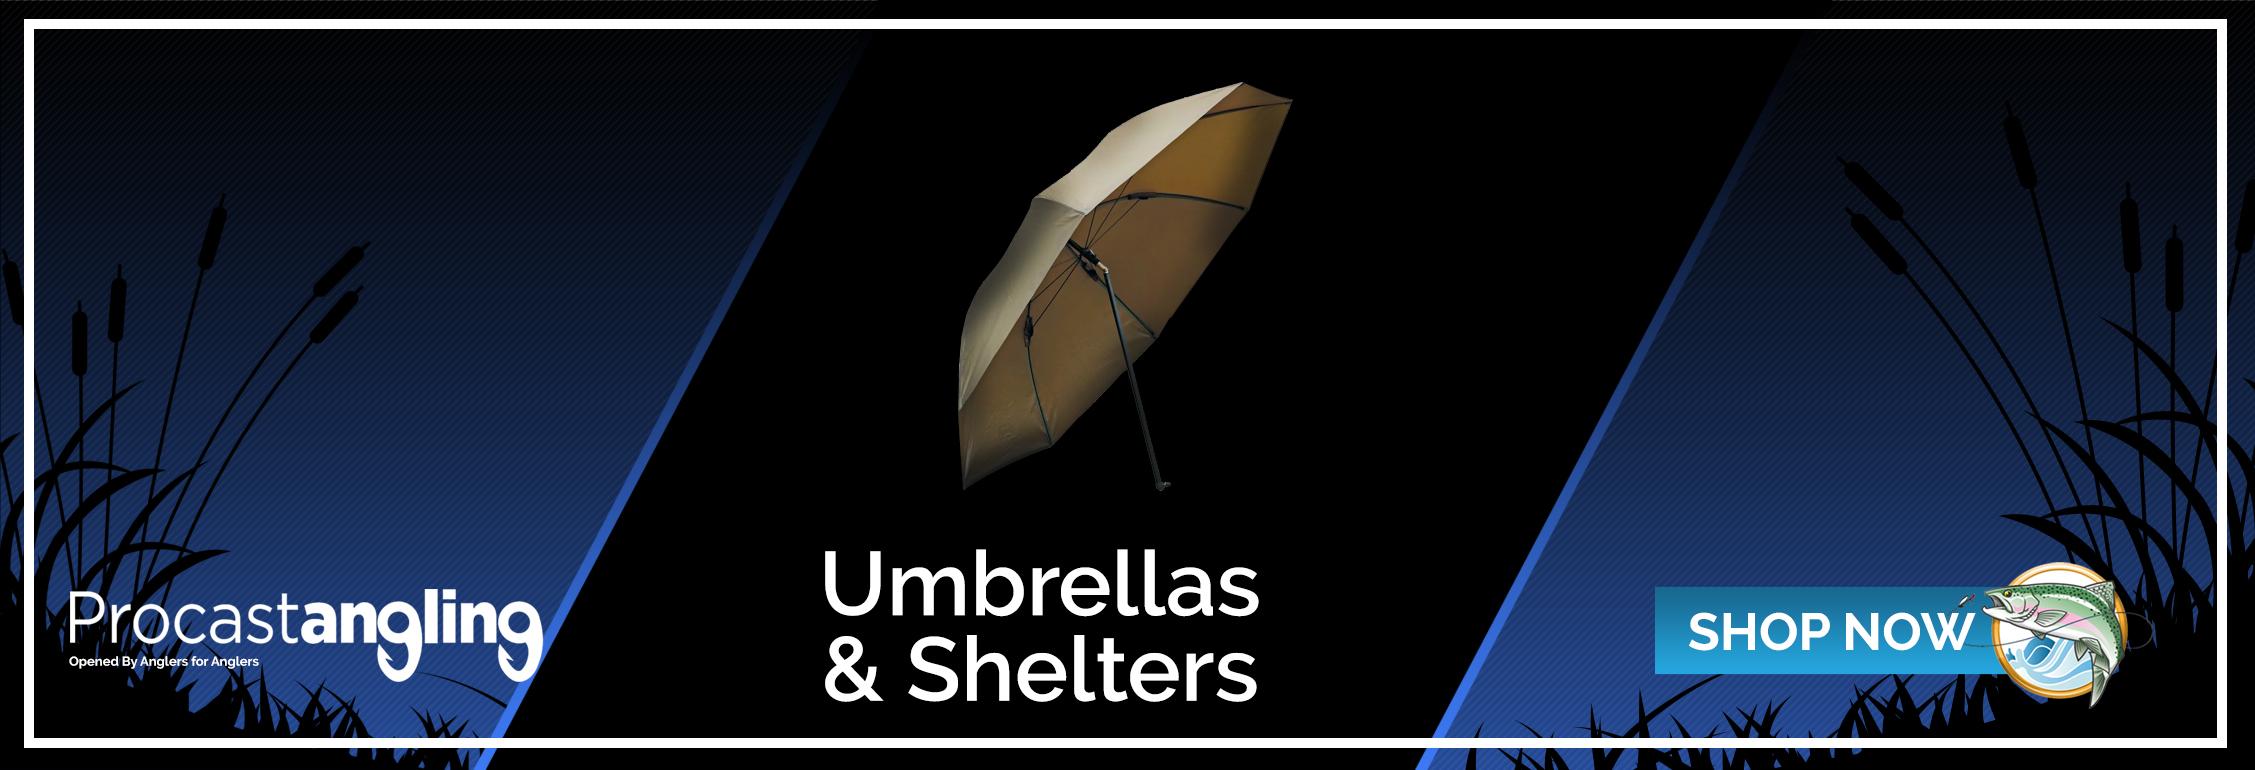 UMBRELLAS & SHELTERS